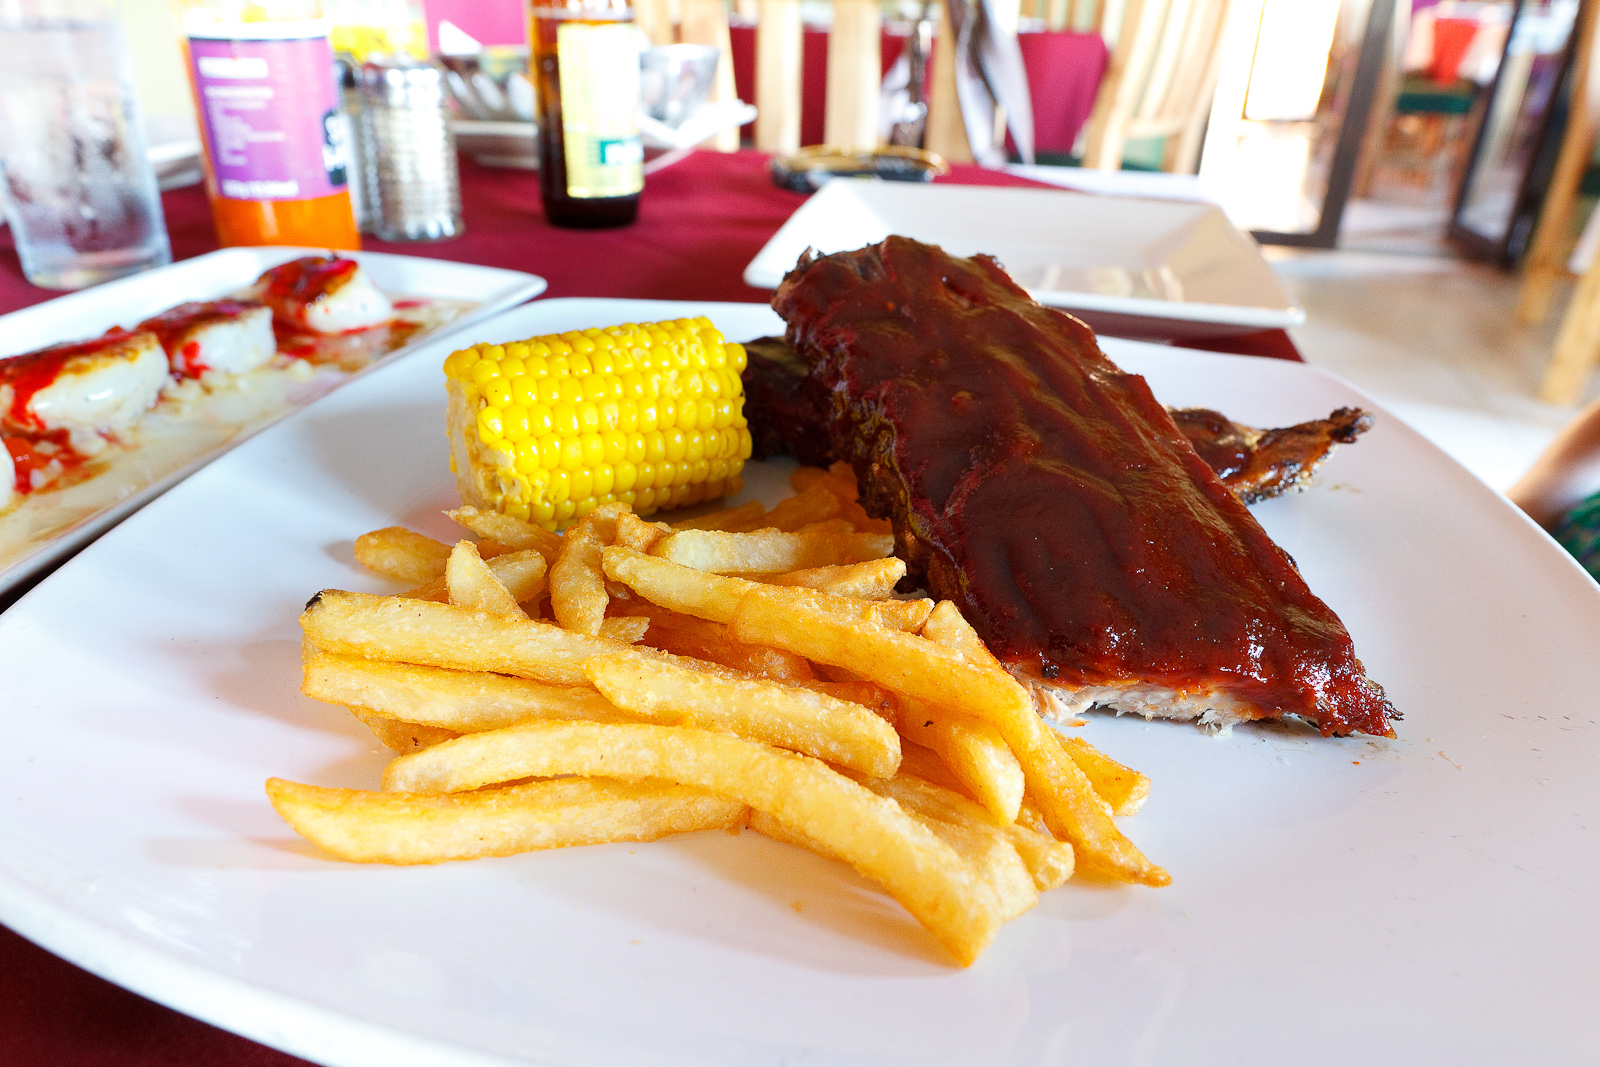 Baby Back Pork Rib, ahumadas y asadas, servidas con elote y papas a la Francesa (Baby back ribs, smoked and grilled, served with corn and french fries) (MXP $200).jpg